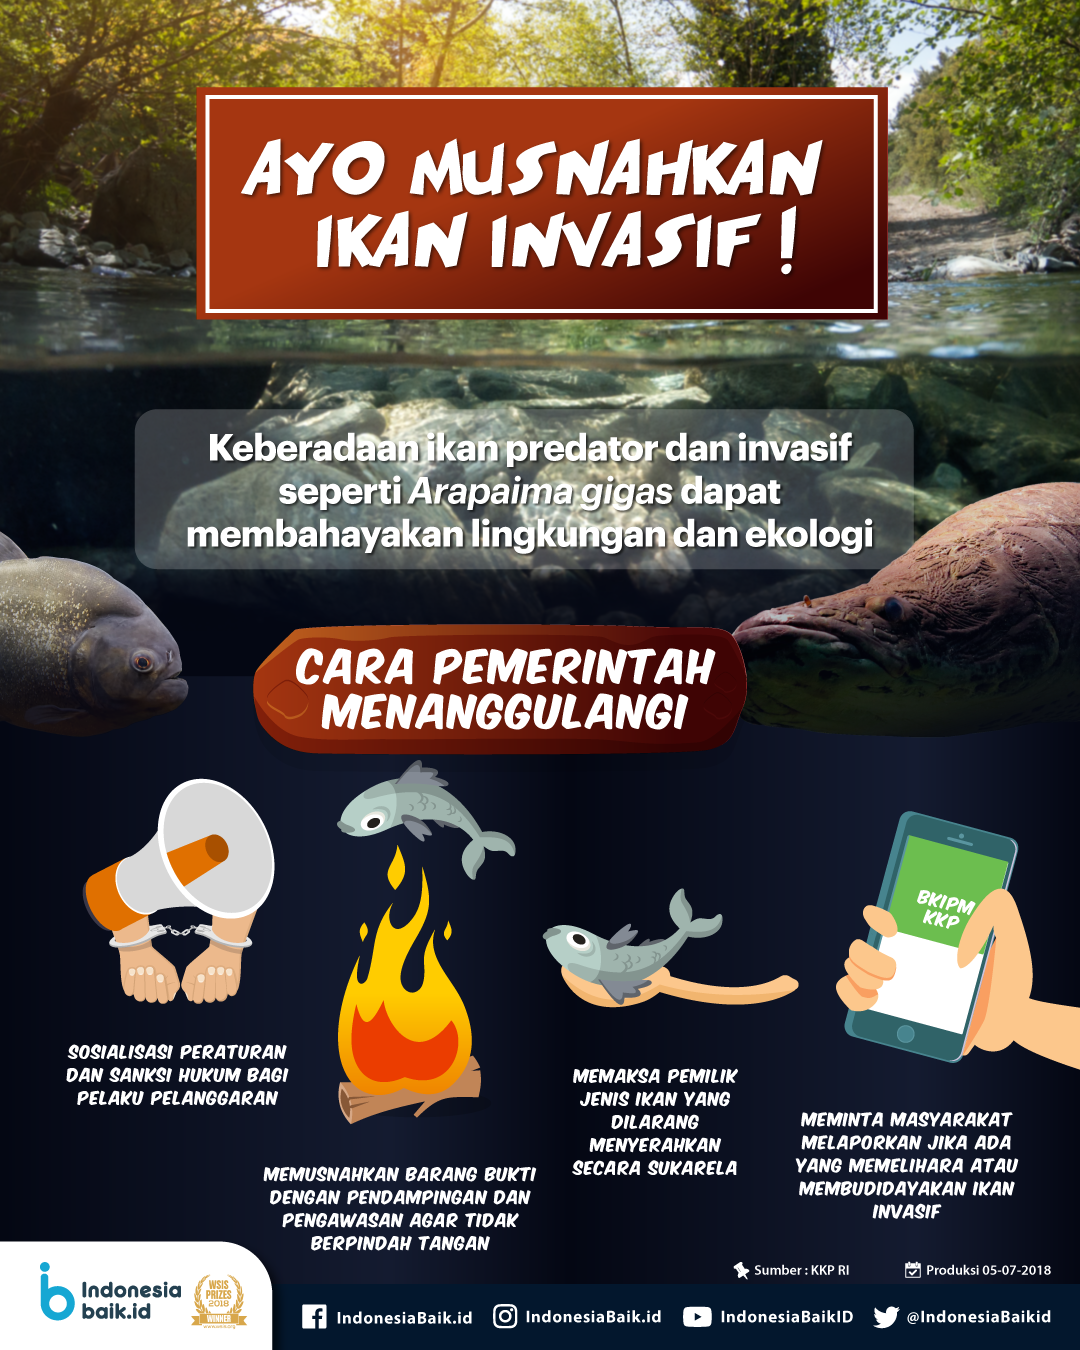 Ayo Musnahkan Ikan Infasif!